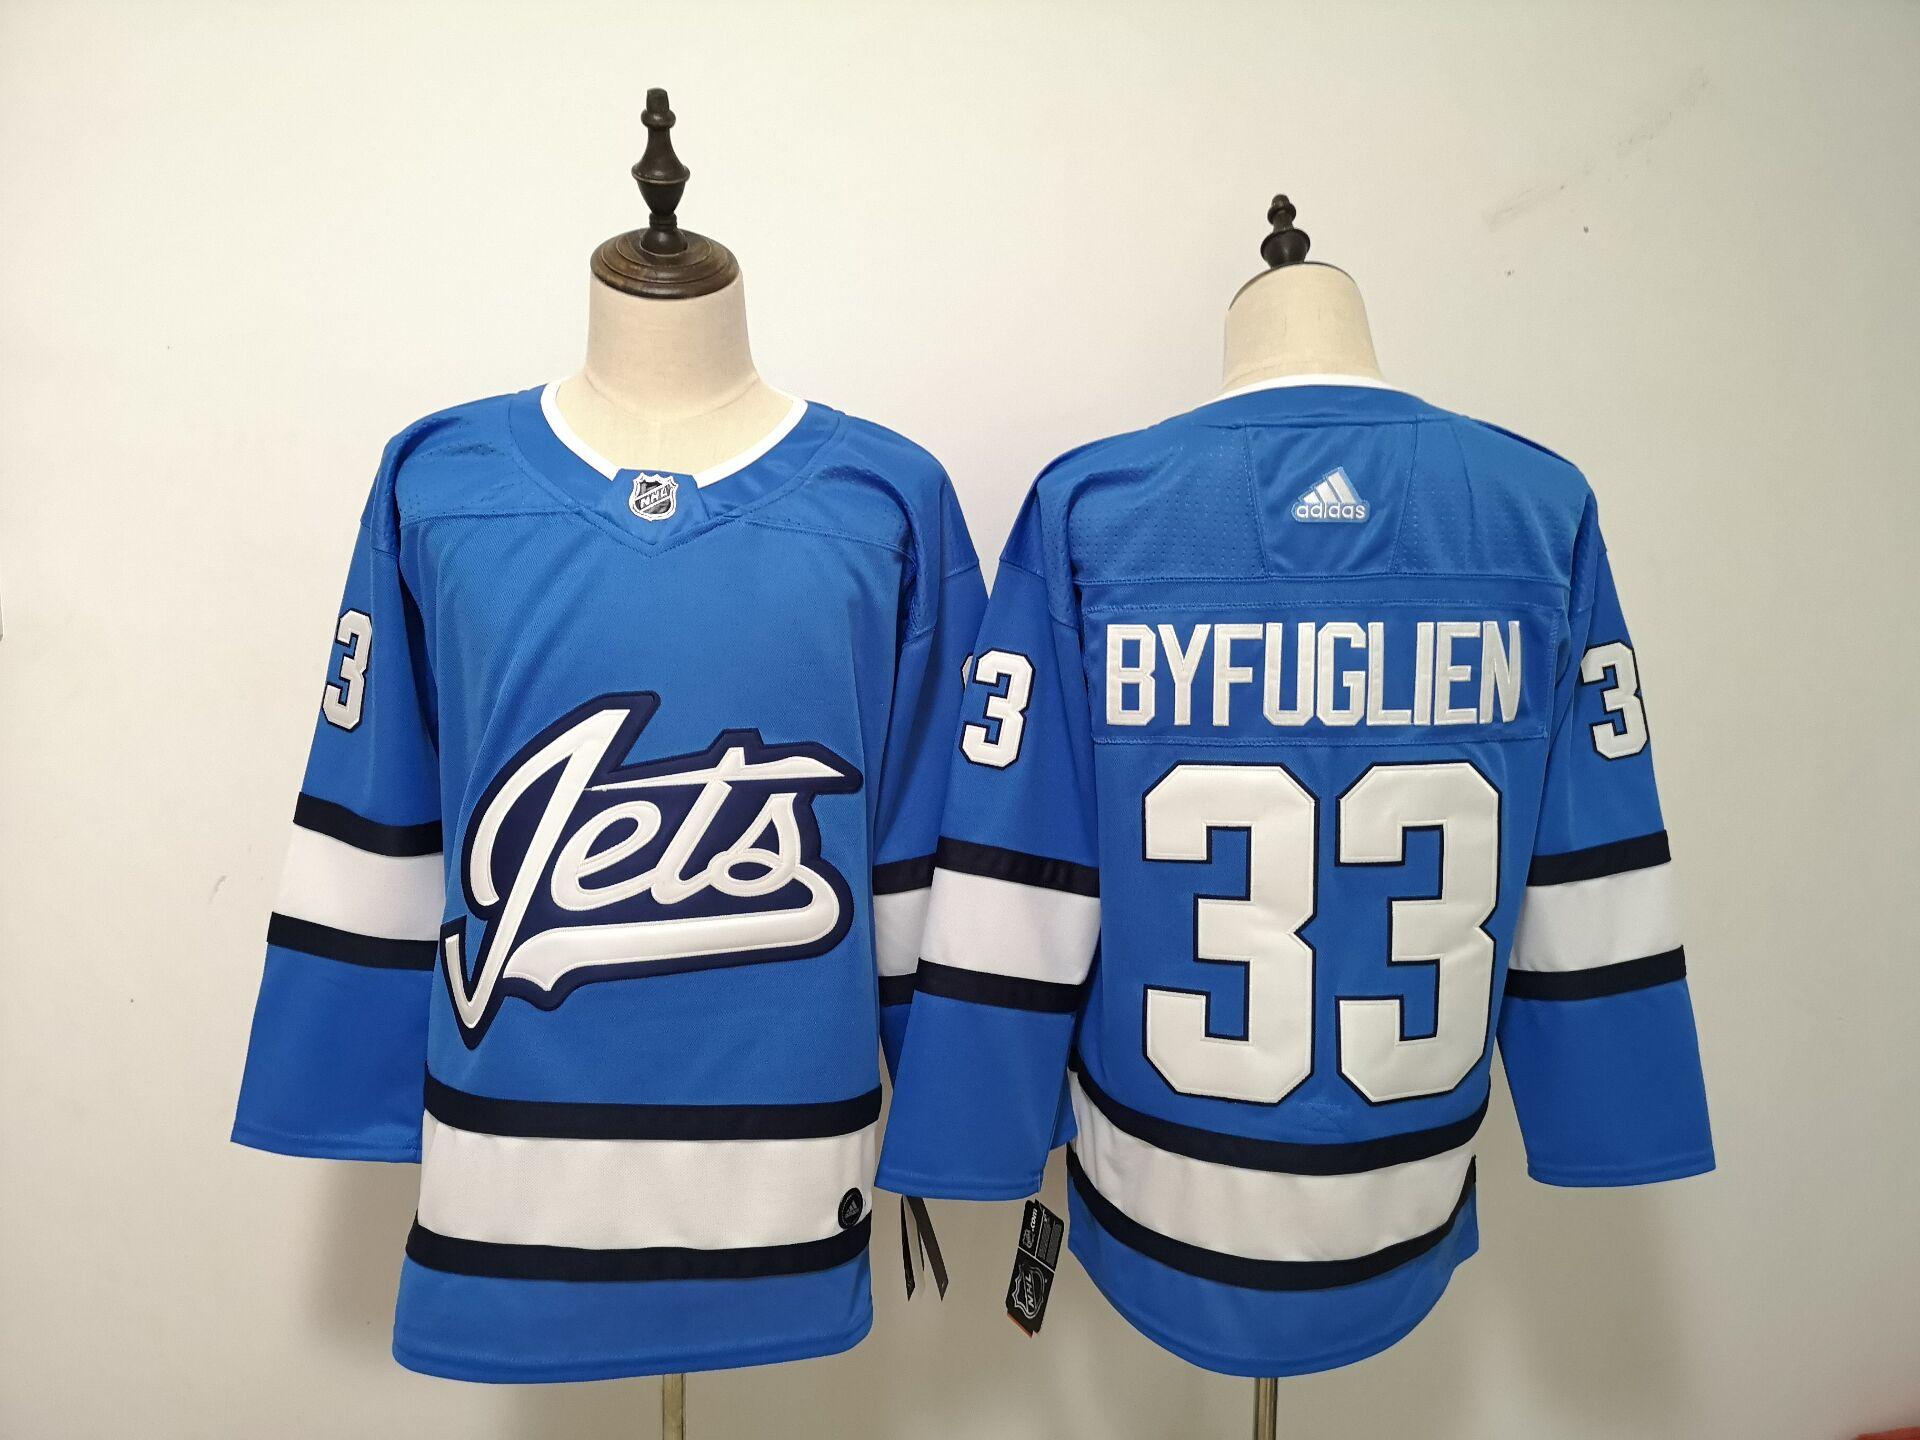 Winnipeg Jets 33 Dustin Byfuglien Blue Alternate Adidas Jersey